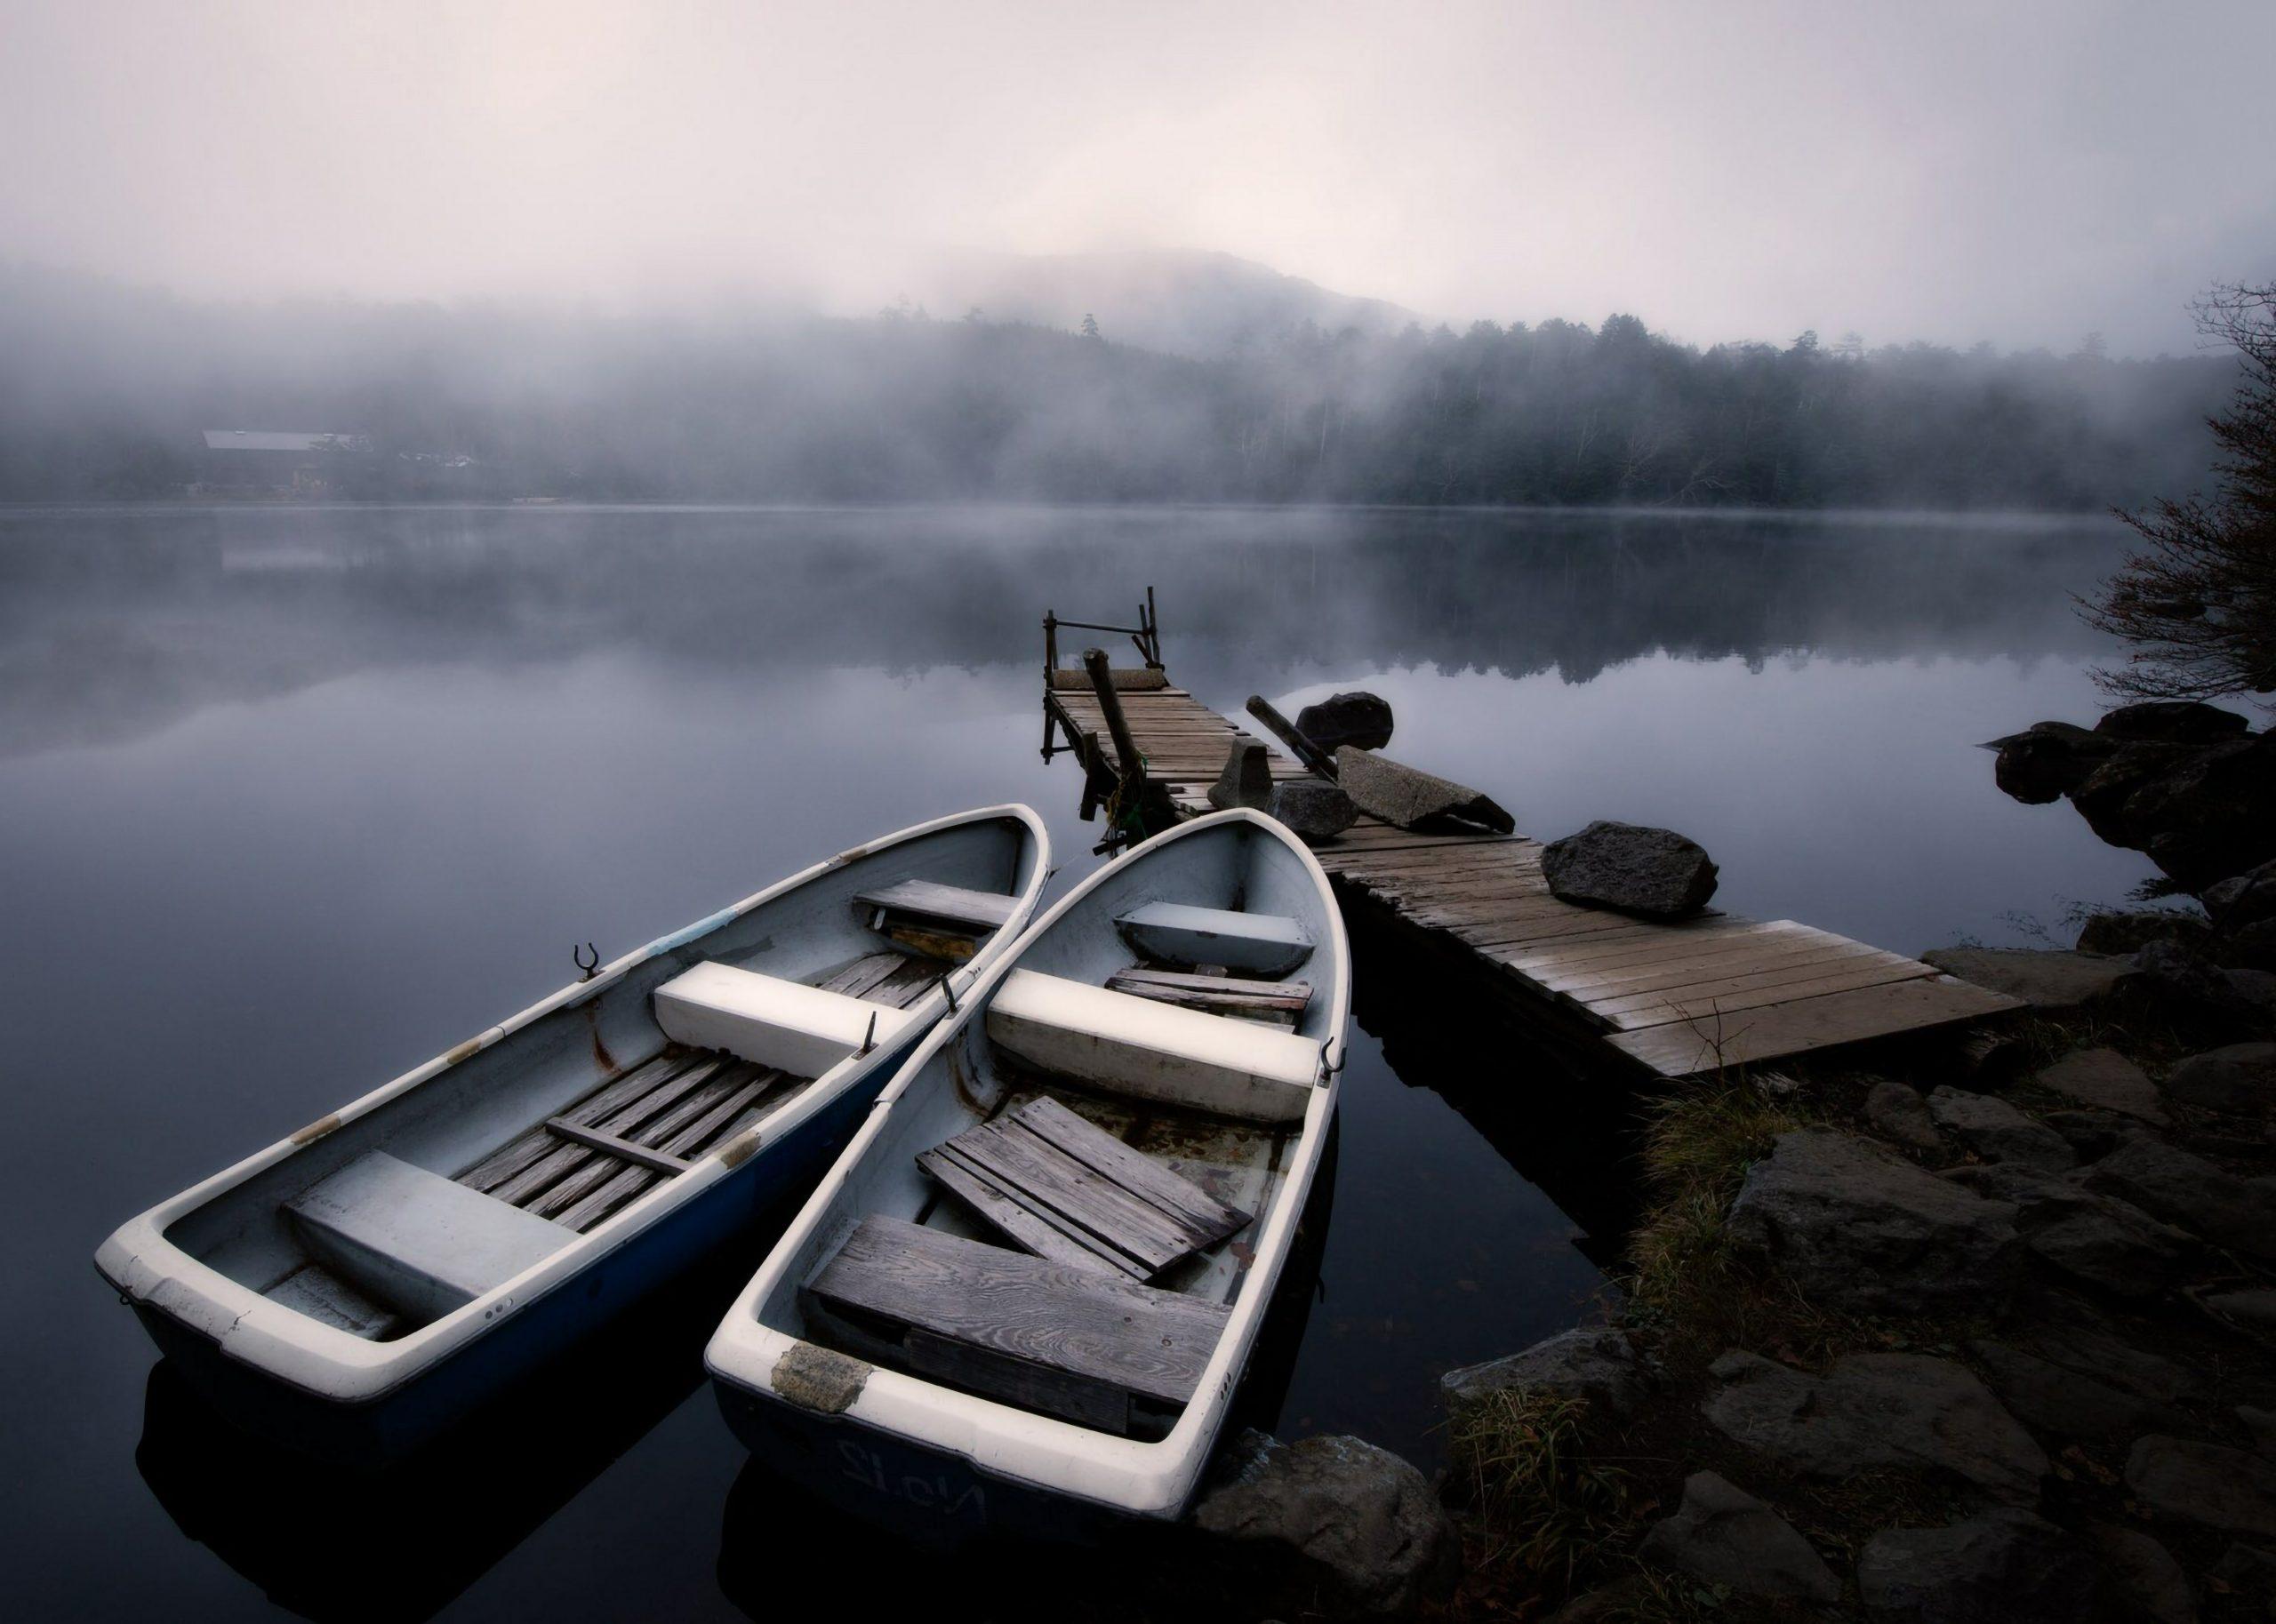 Boote Reise Ruhe Natur